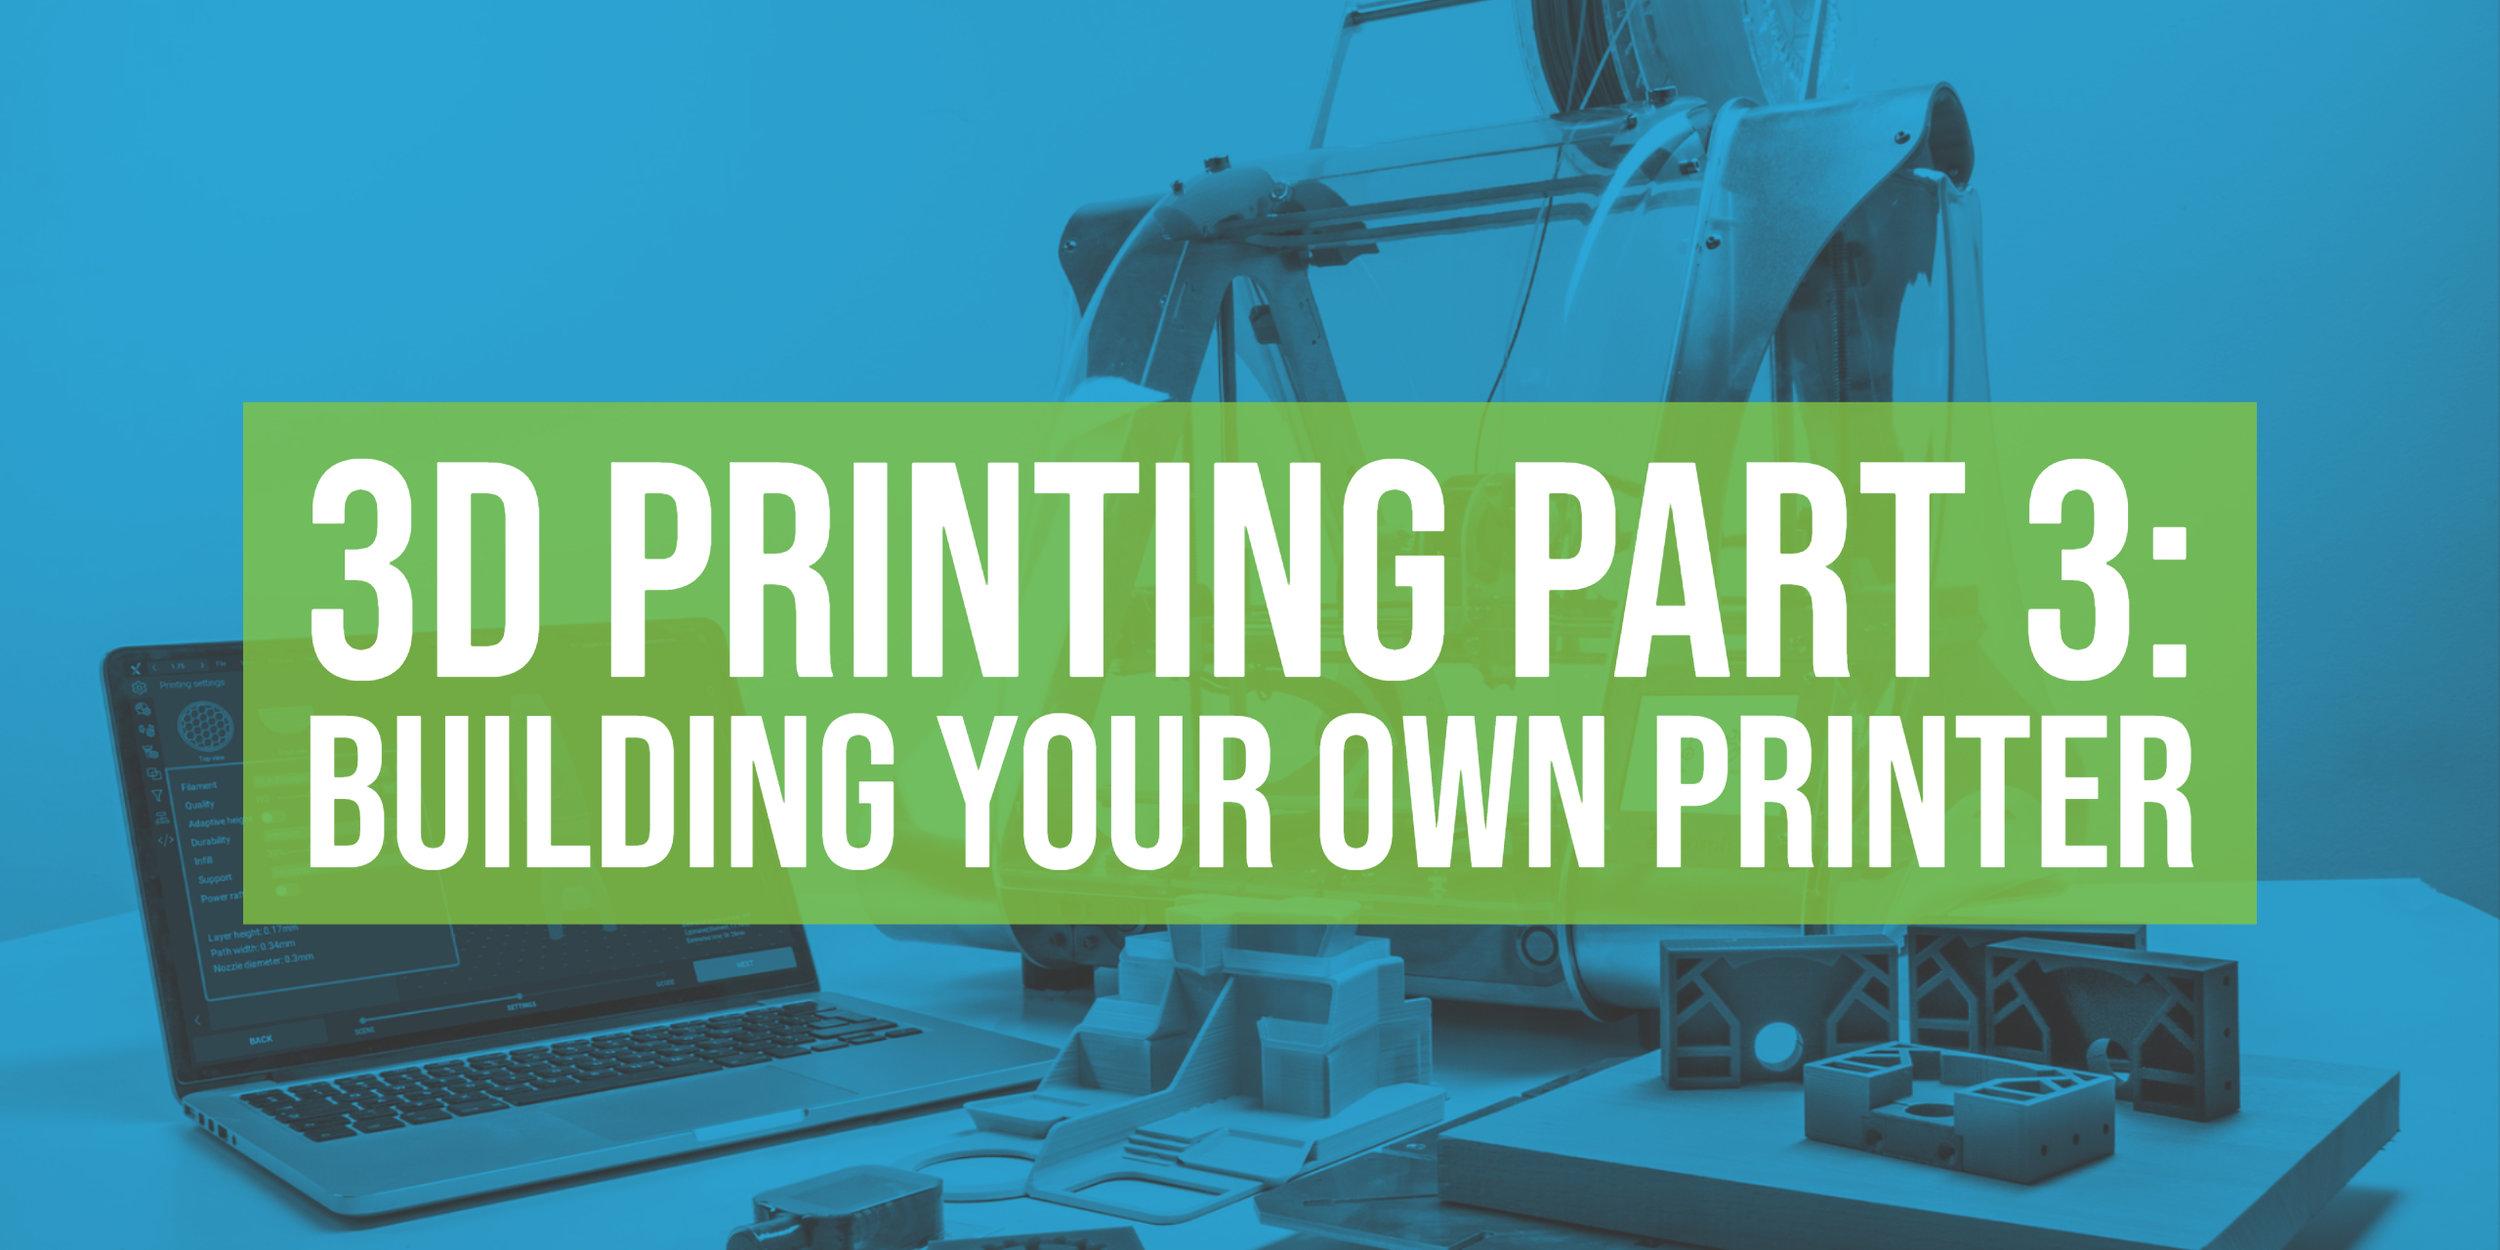 3D Printing Part 3 Post Header.jpg